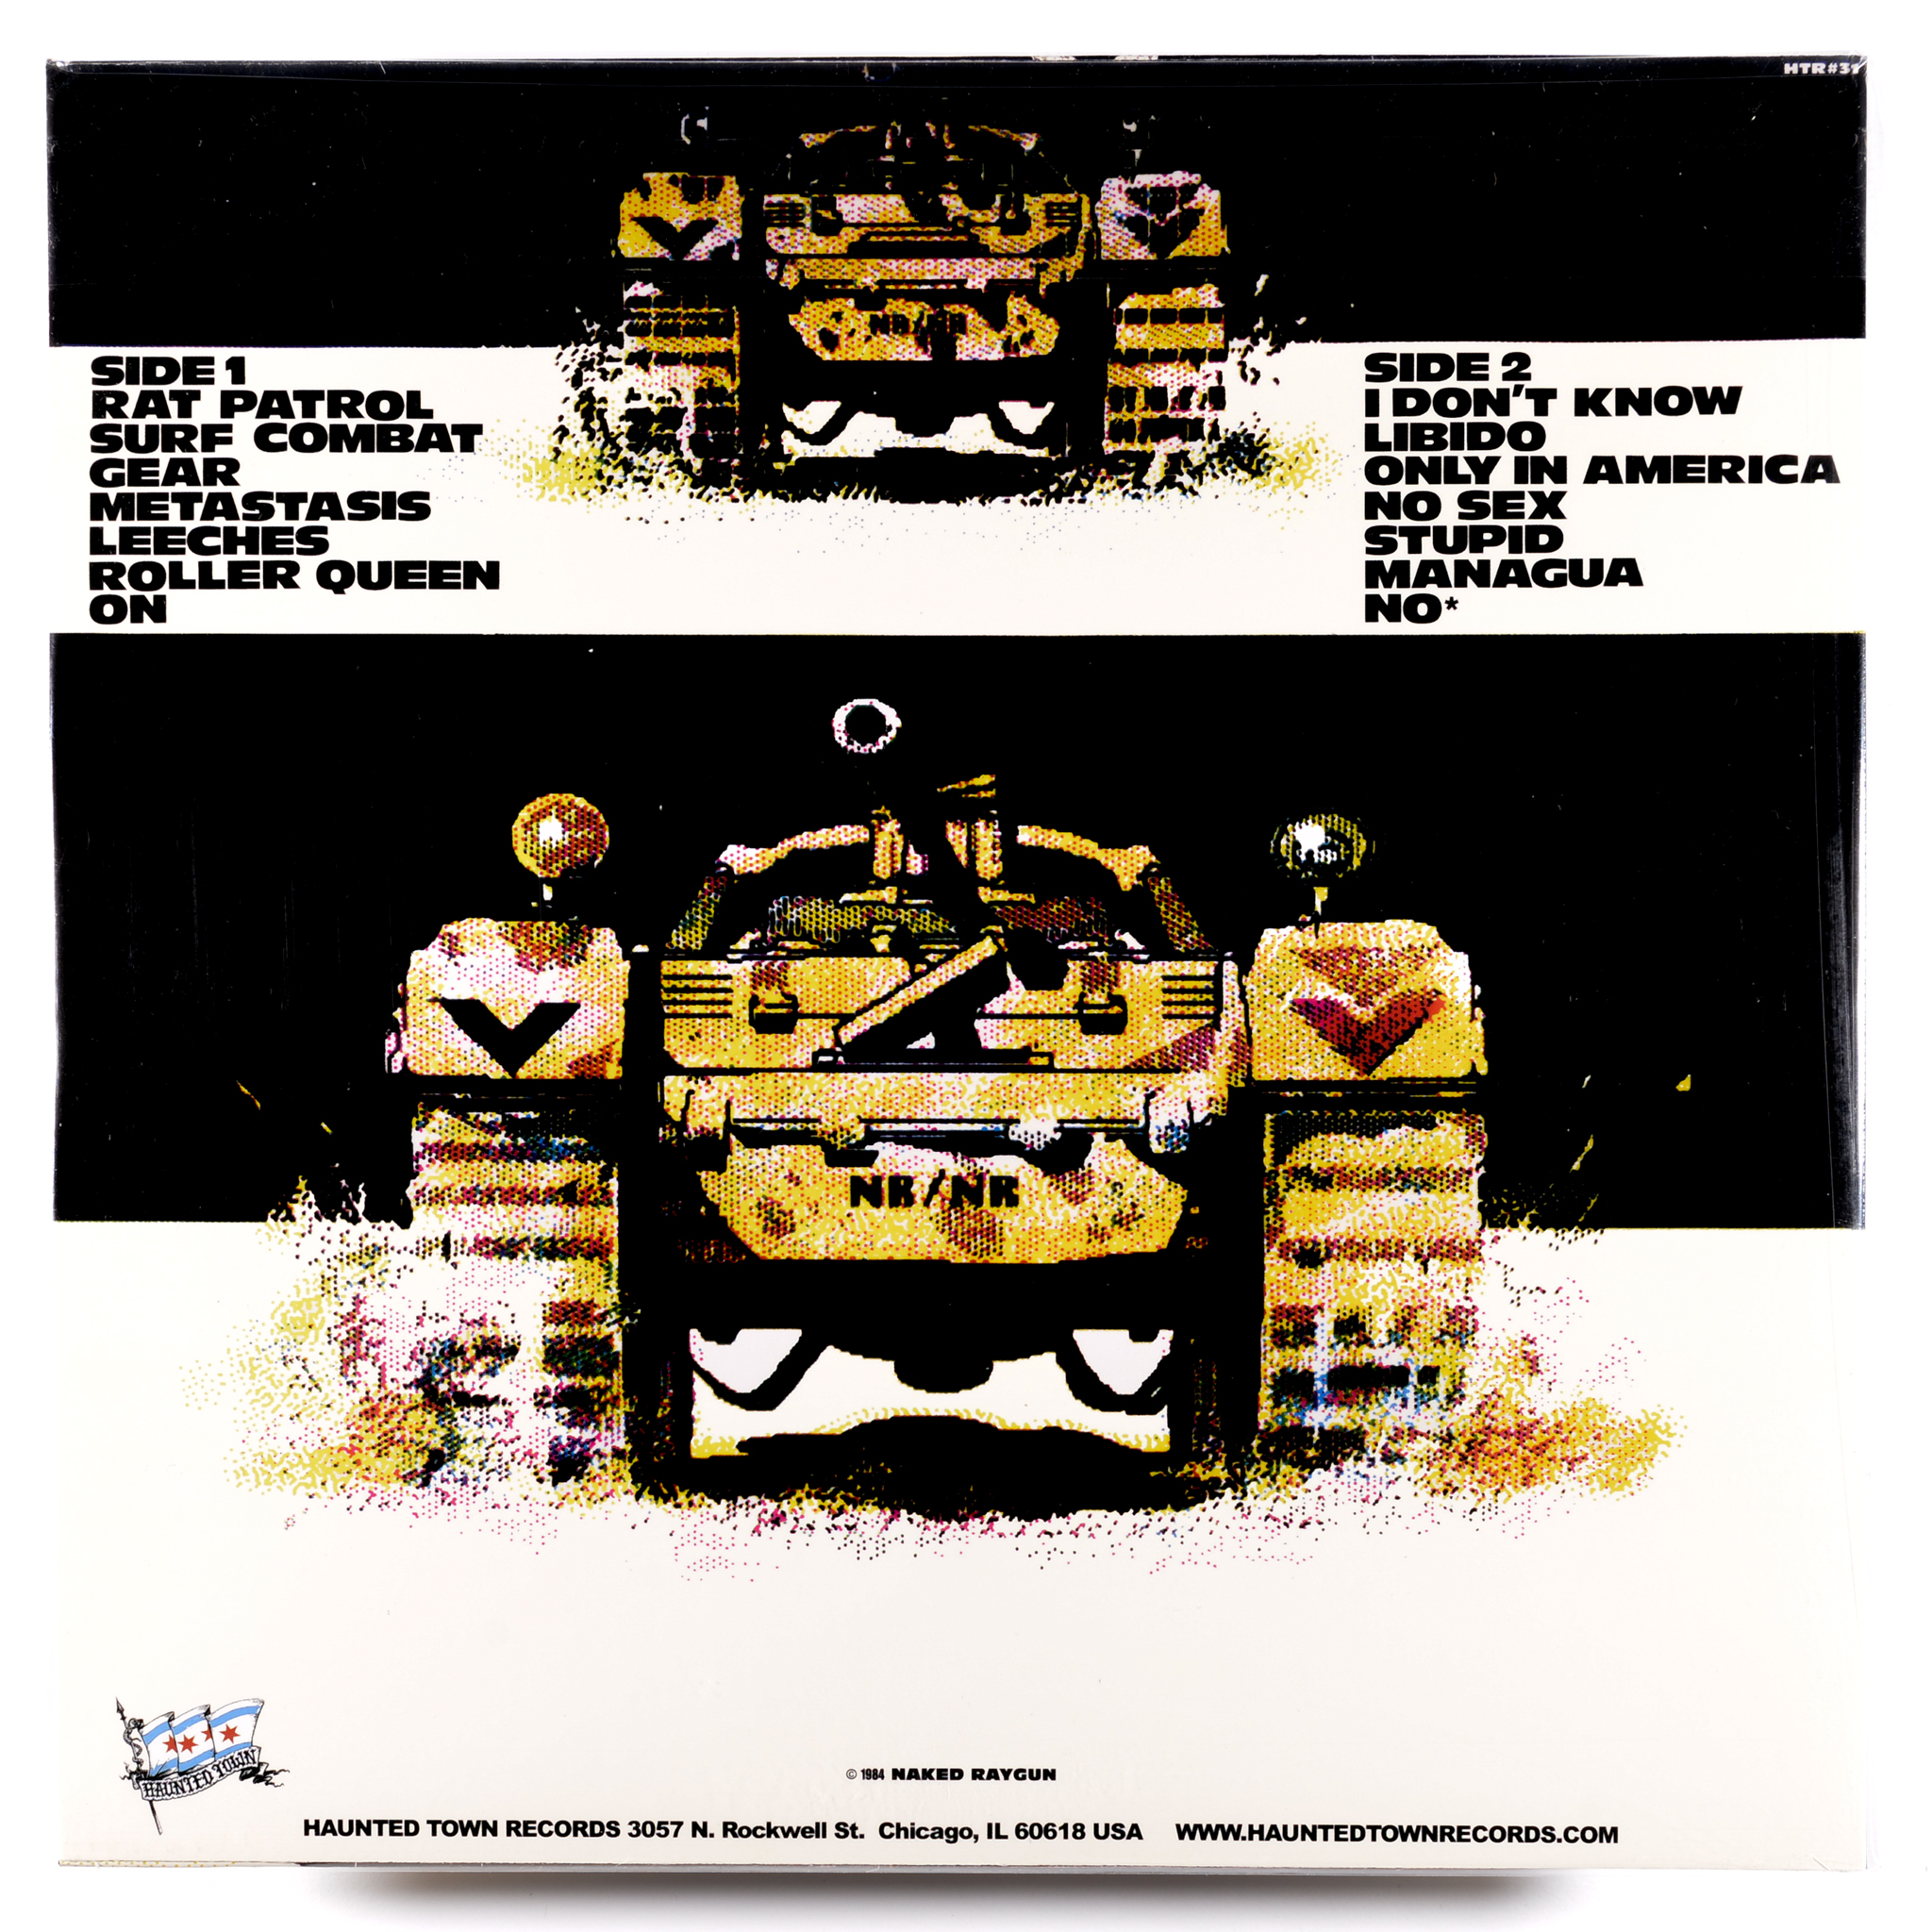 Naked Raygun - Throb Throb (1988, CD) | Discogs